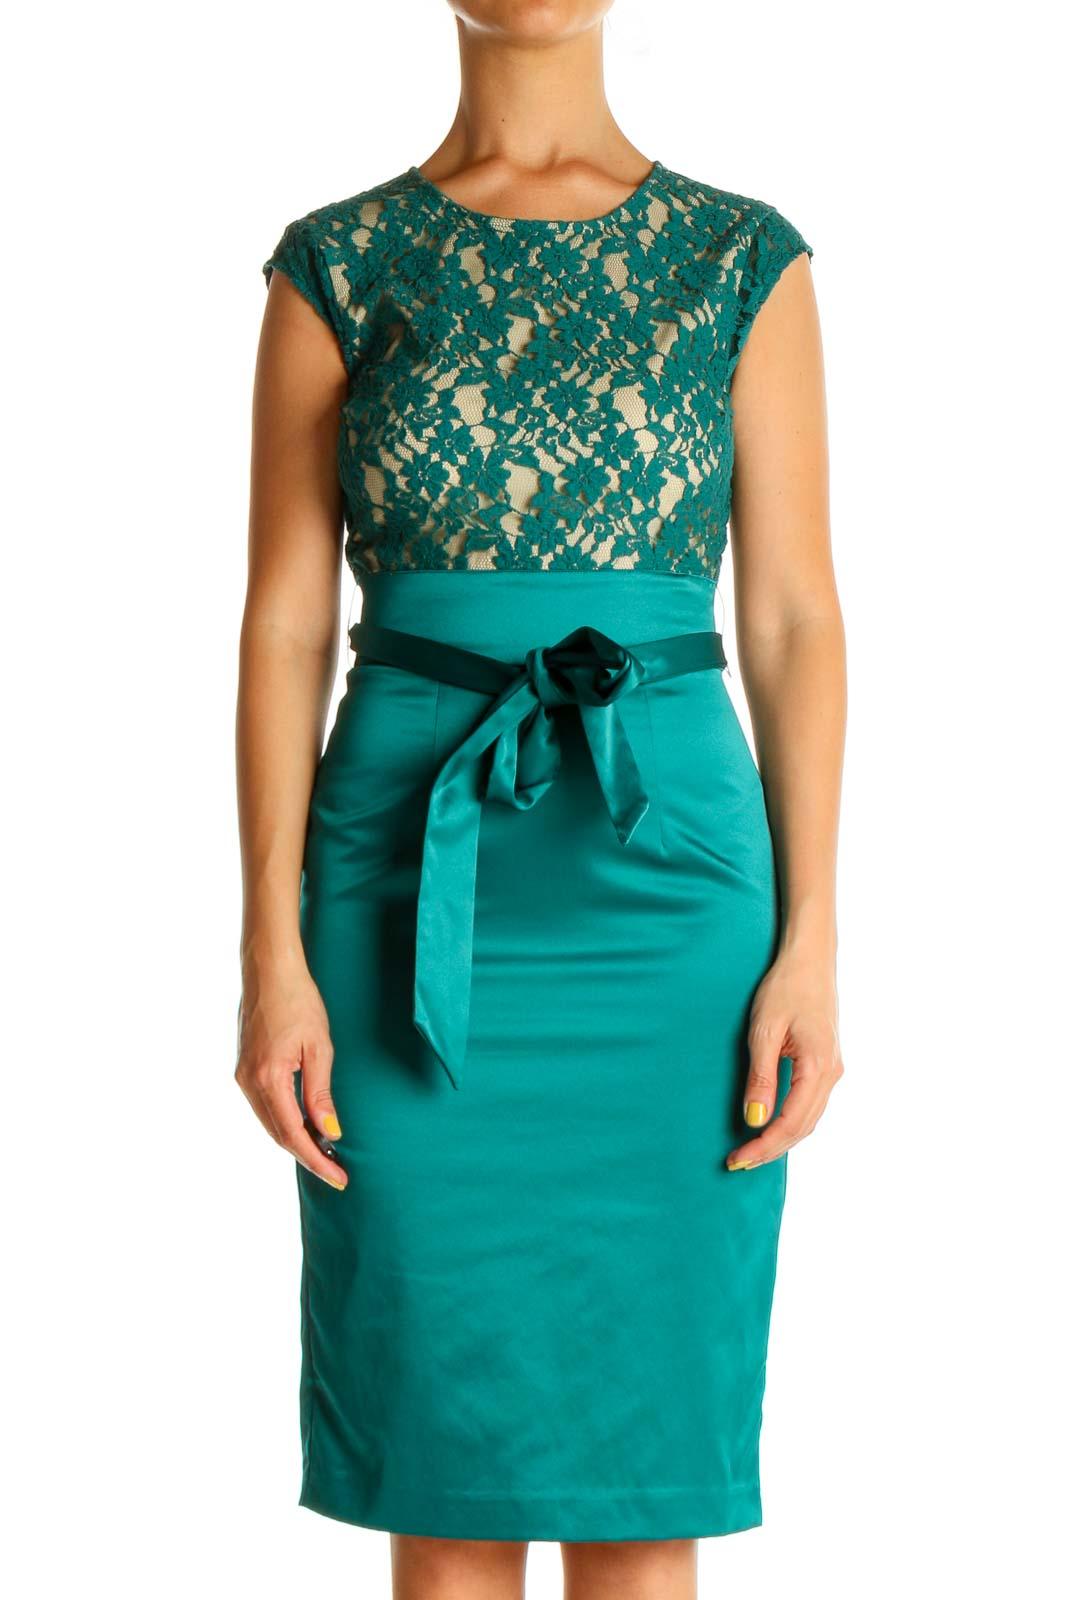 Green Blue Lace Work Sheath Dress Front